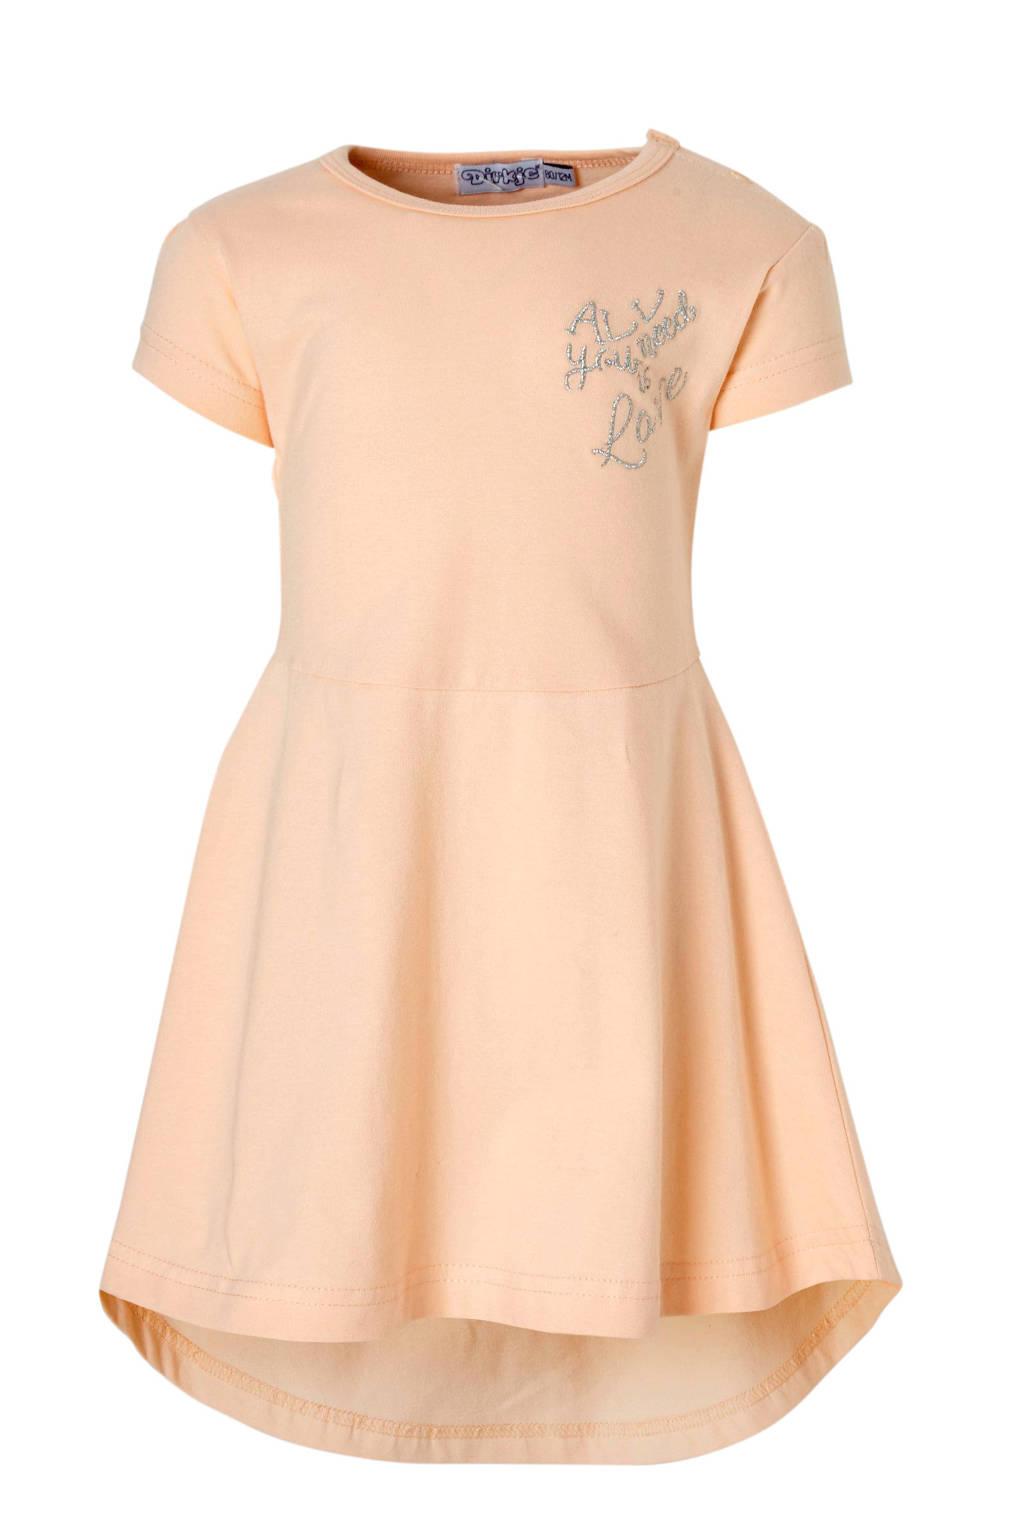 Dirkje jurk met tekst, Lichtoranje